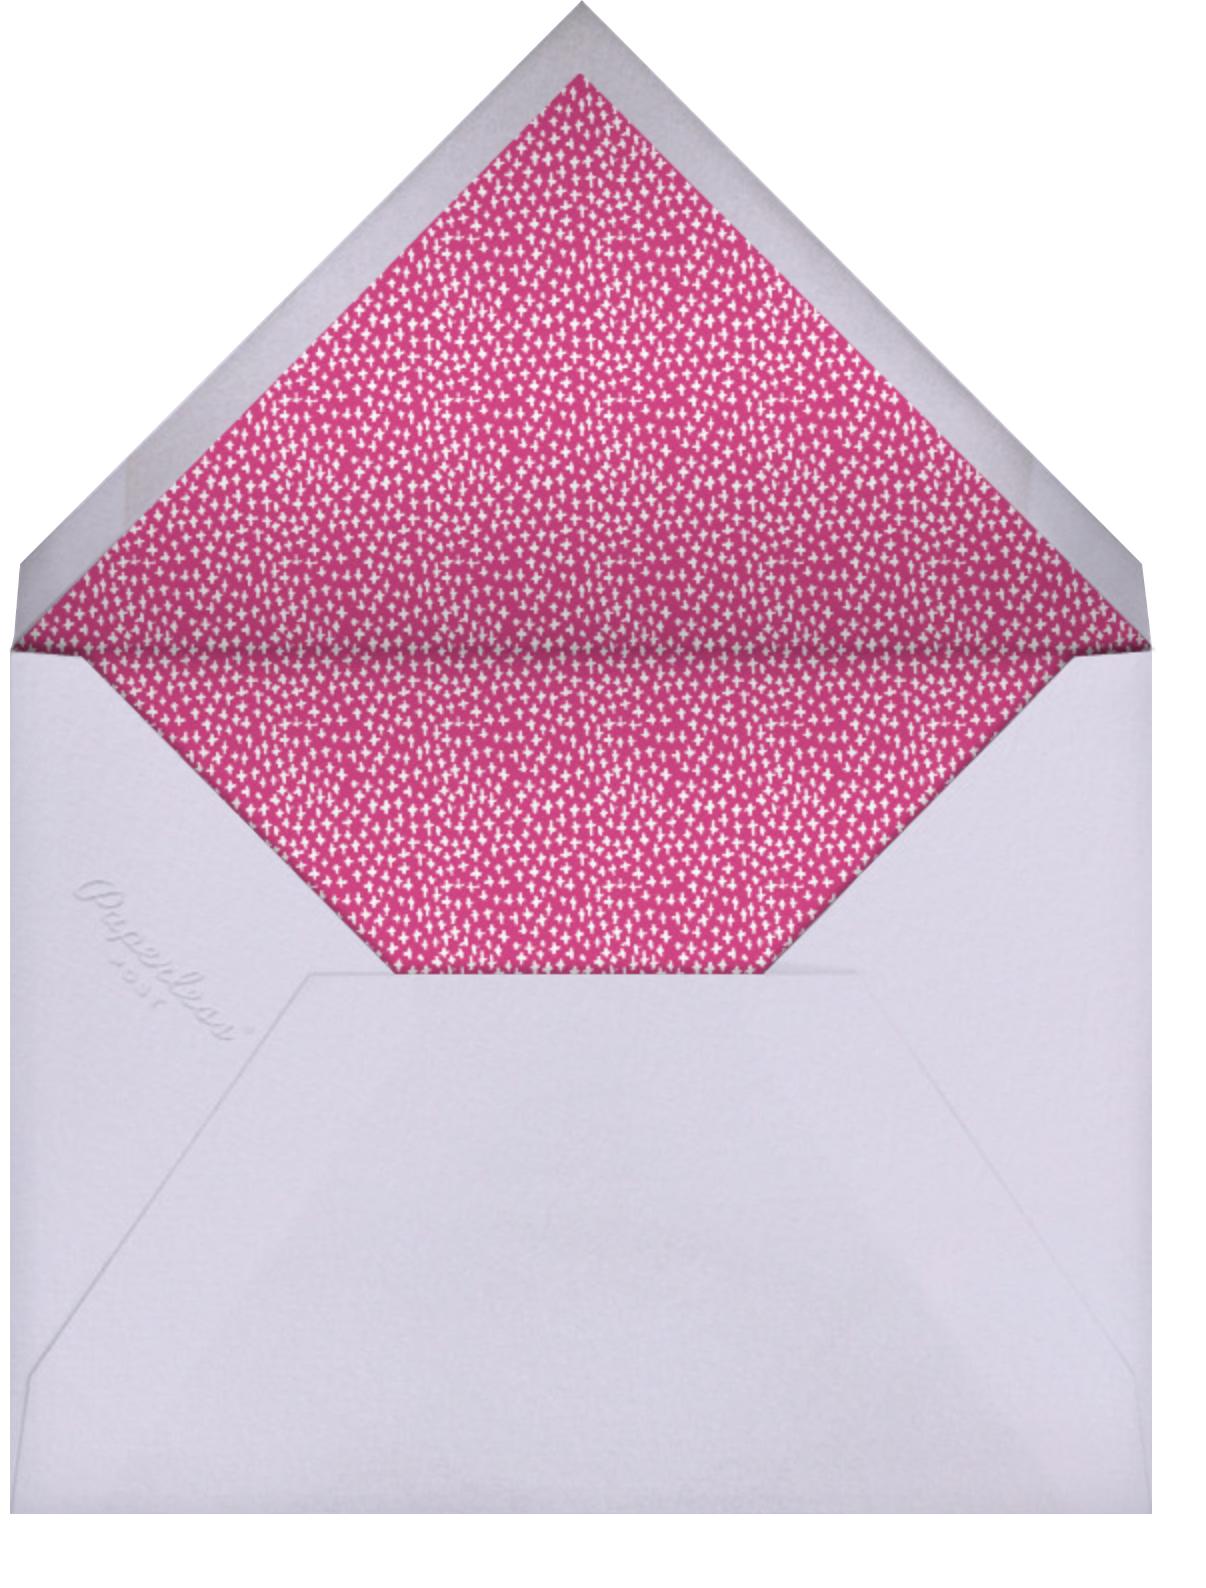 Miss Ivy - Mr. Boddington's Studio - Kids' birthday - envelope back